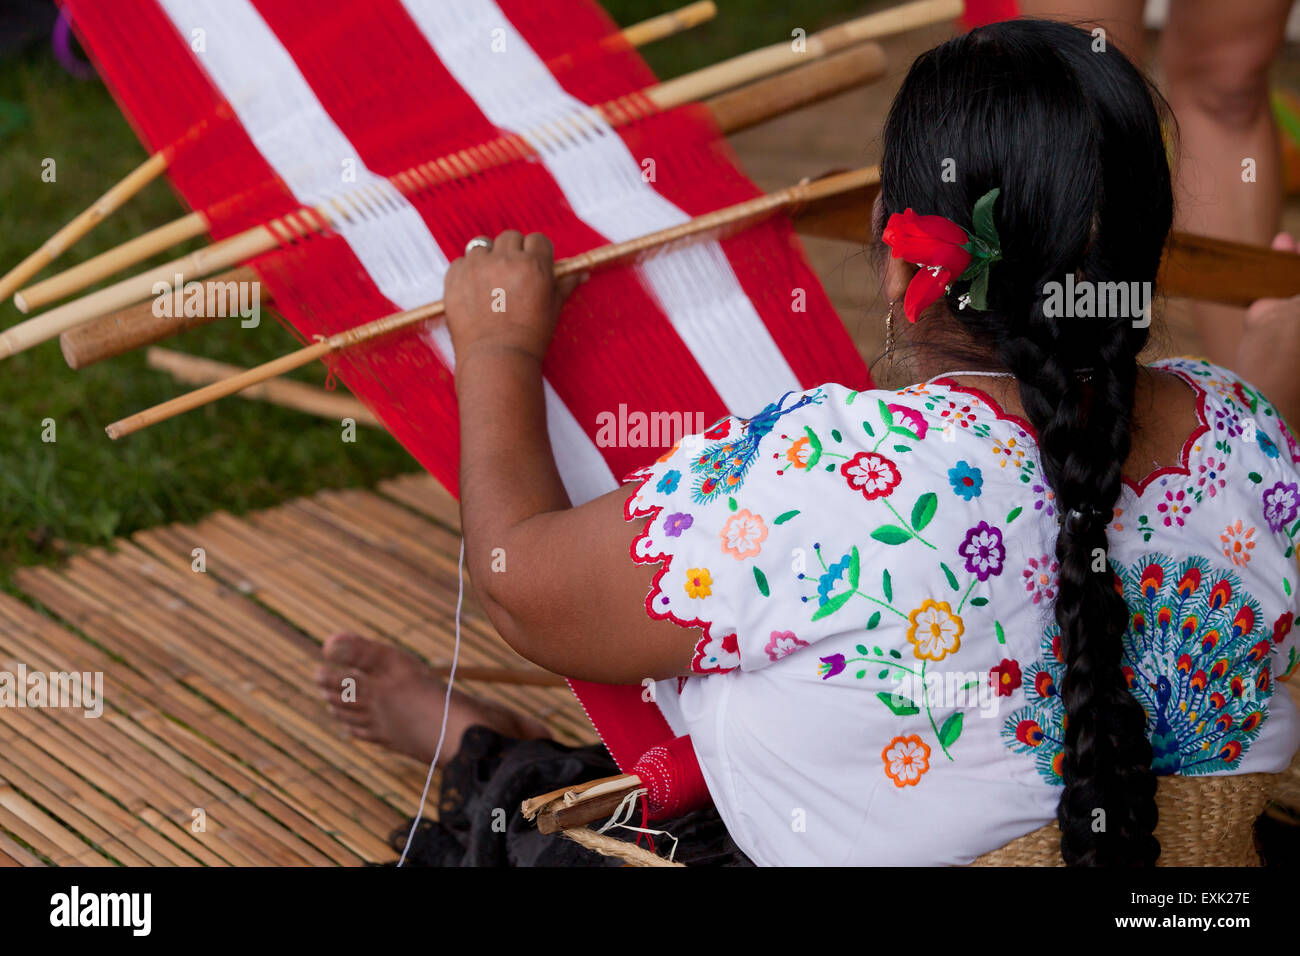 Peruvian woman from Chinchero weaving traditional fabric using back strap loom - Stock Image